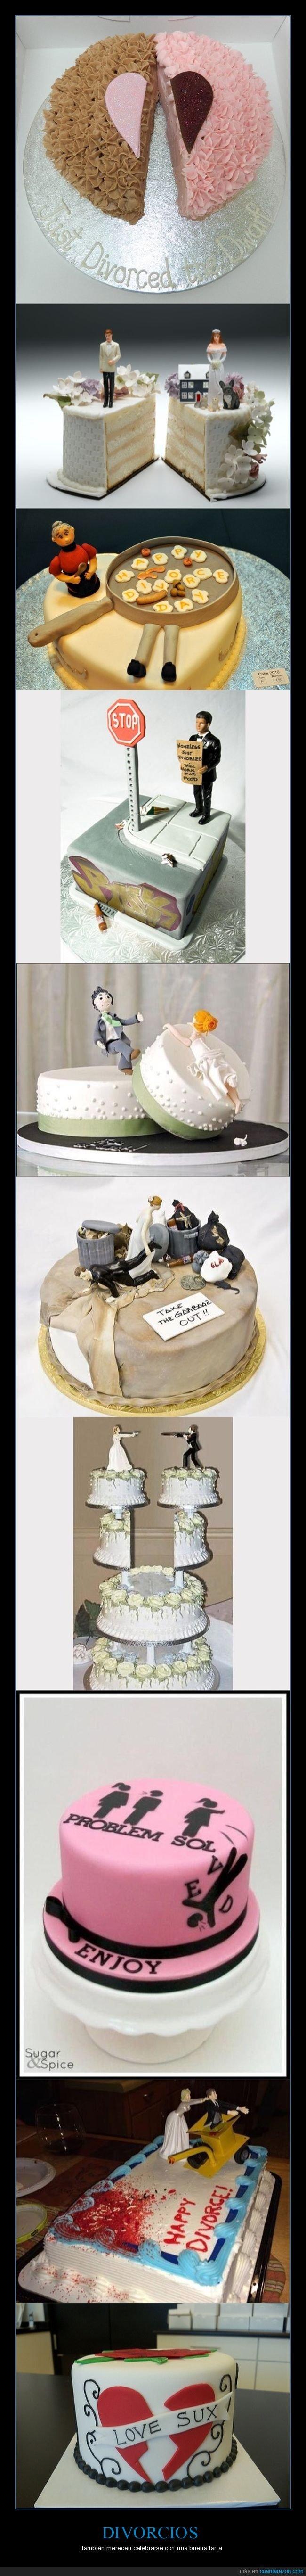 divorcio,repostería,tartas